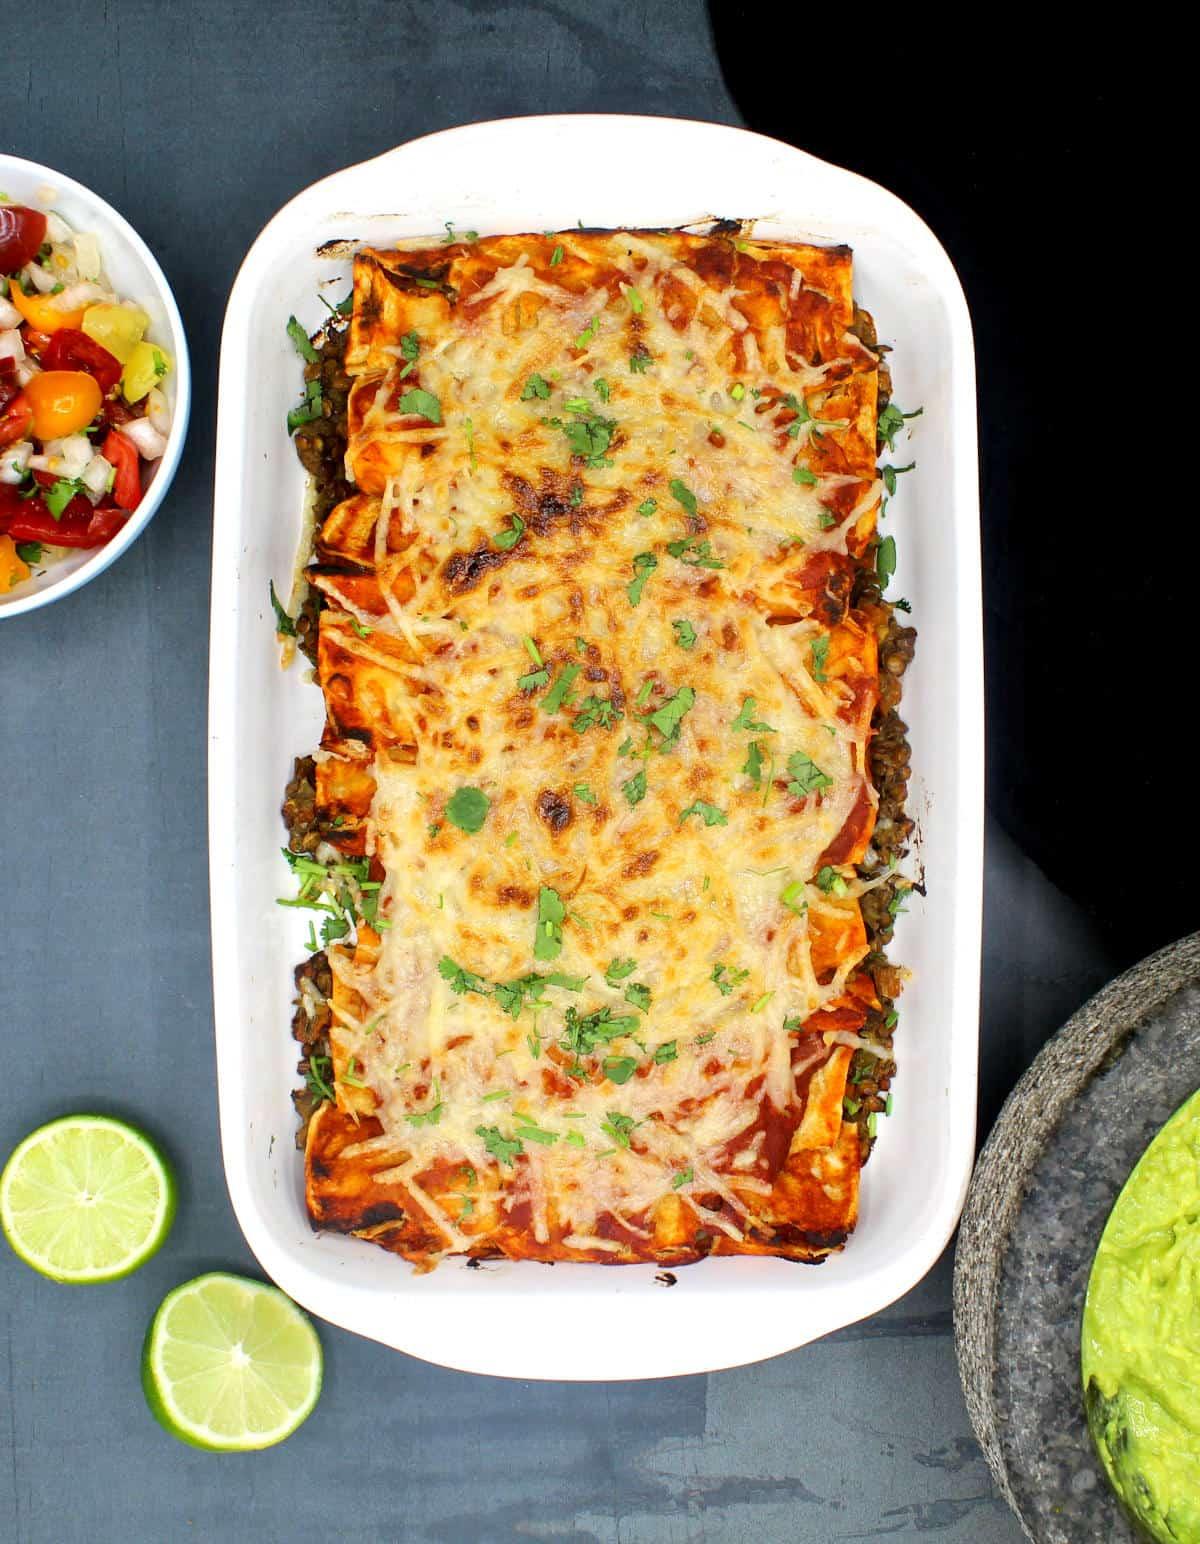 The vegan enchilada casserole with tomato and onion salsa, guacamole in molcajete and limes.